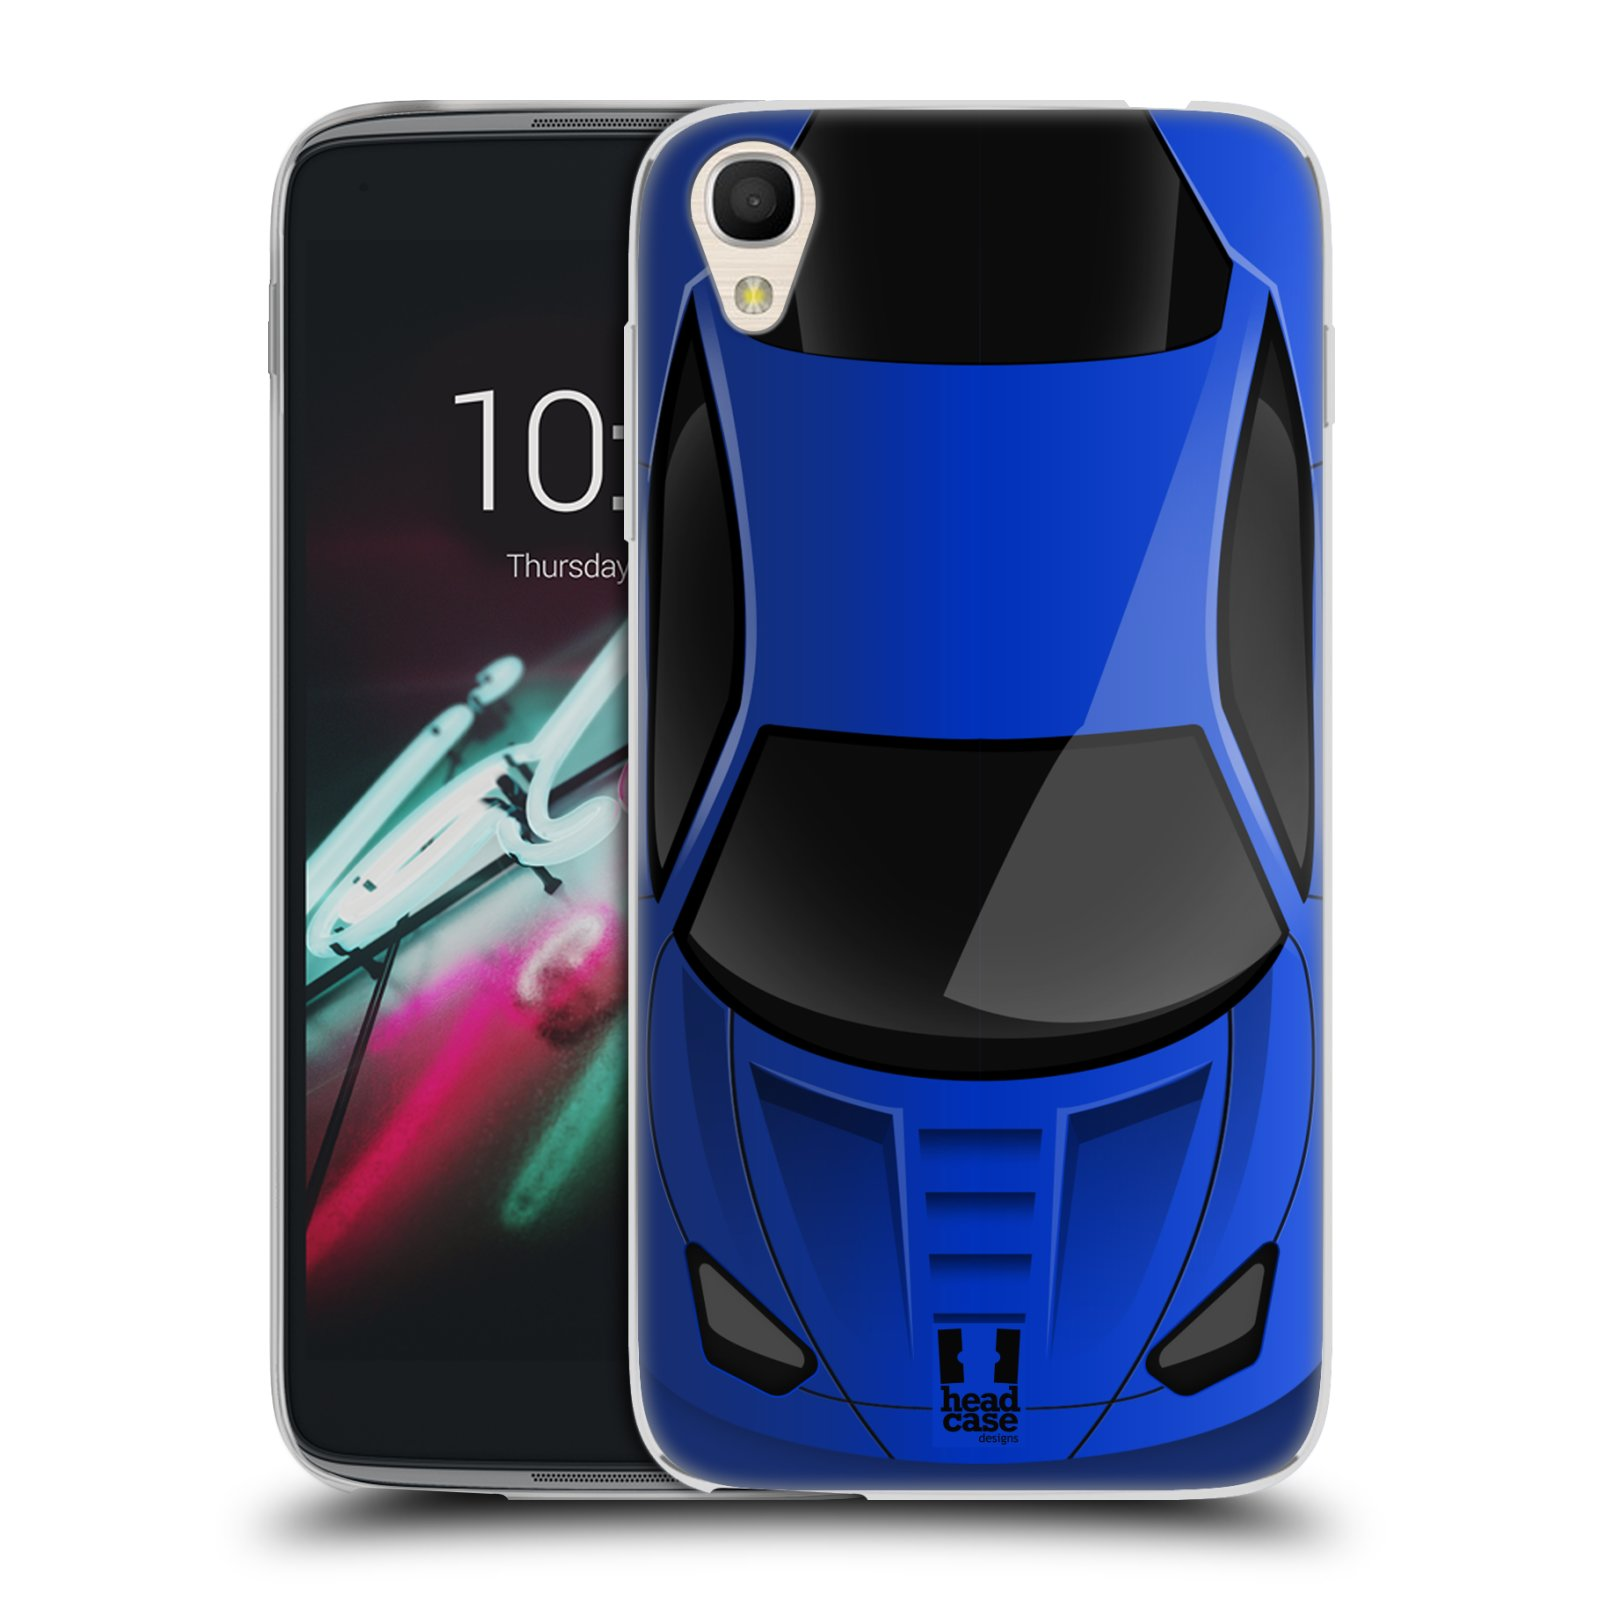 "Silikonové pouzdro na mobil Alcatel One Touch 6039Y Idol 3 HEAD CASE AUTO MODRÉ (Silikonový kryt či obal na mobilní telefon Alcatel One Touch Idol 3 OT-6039Y s 4,7"" displejem)"